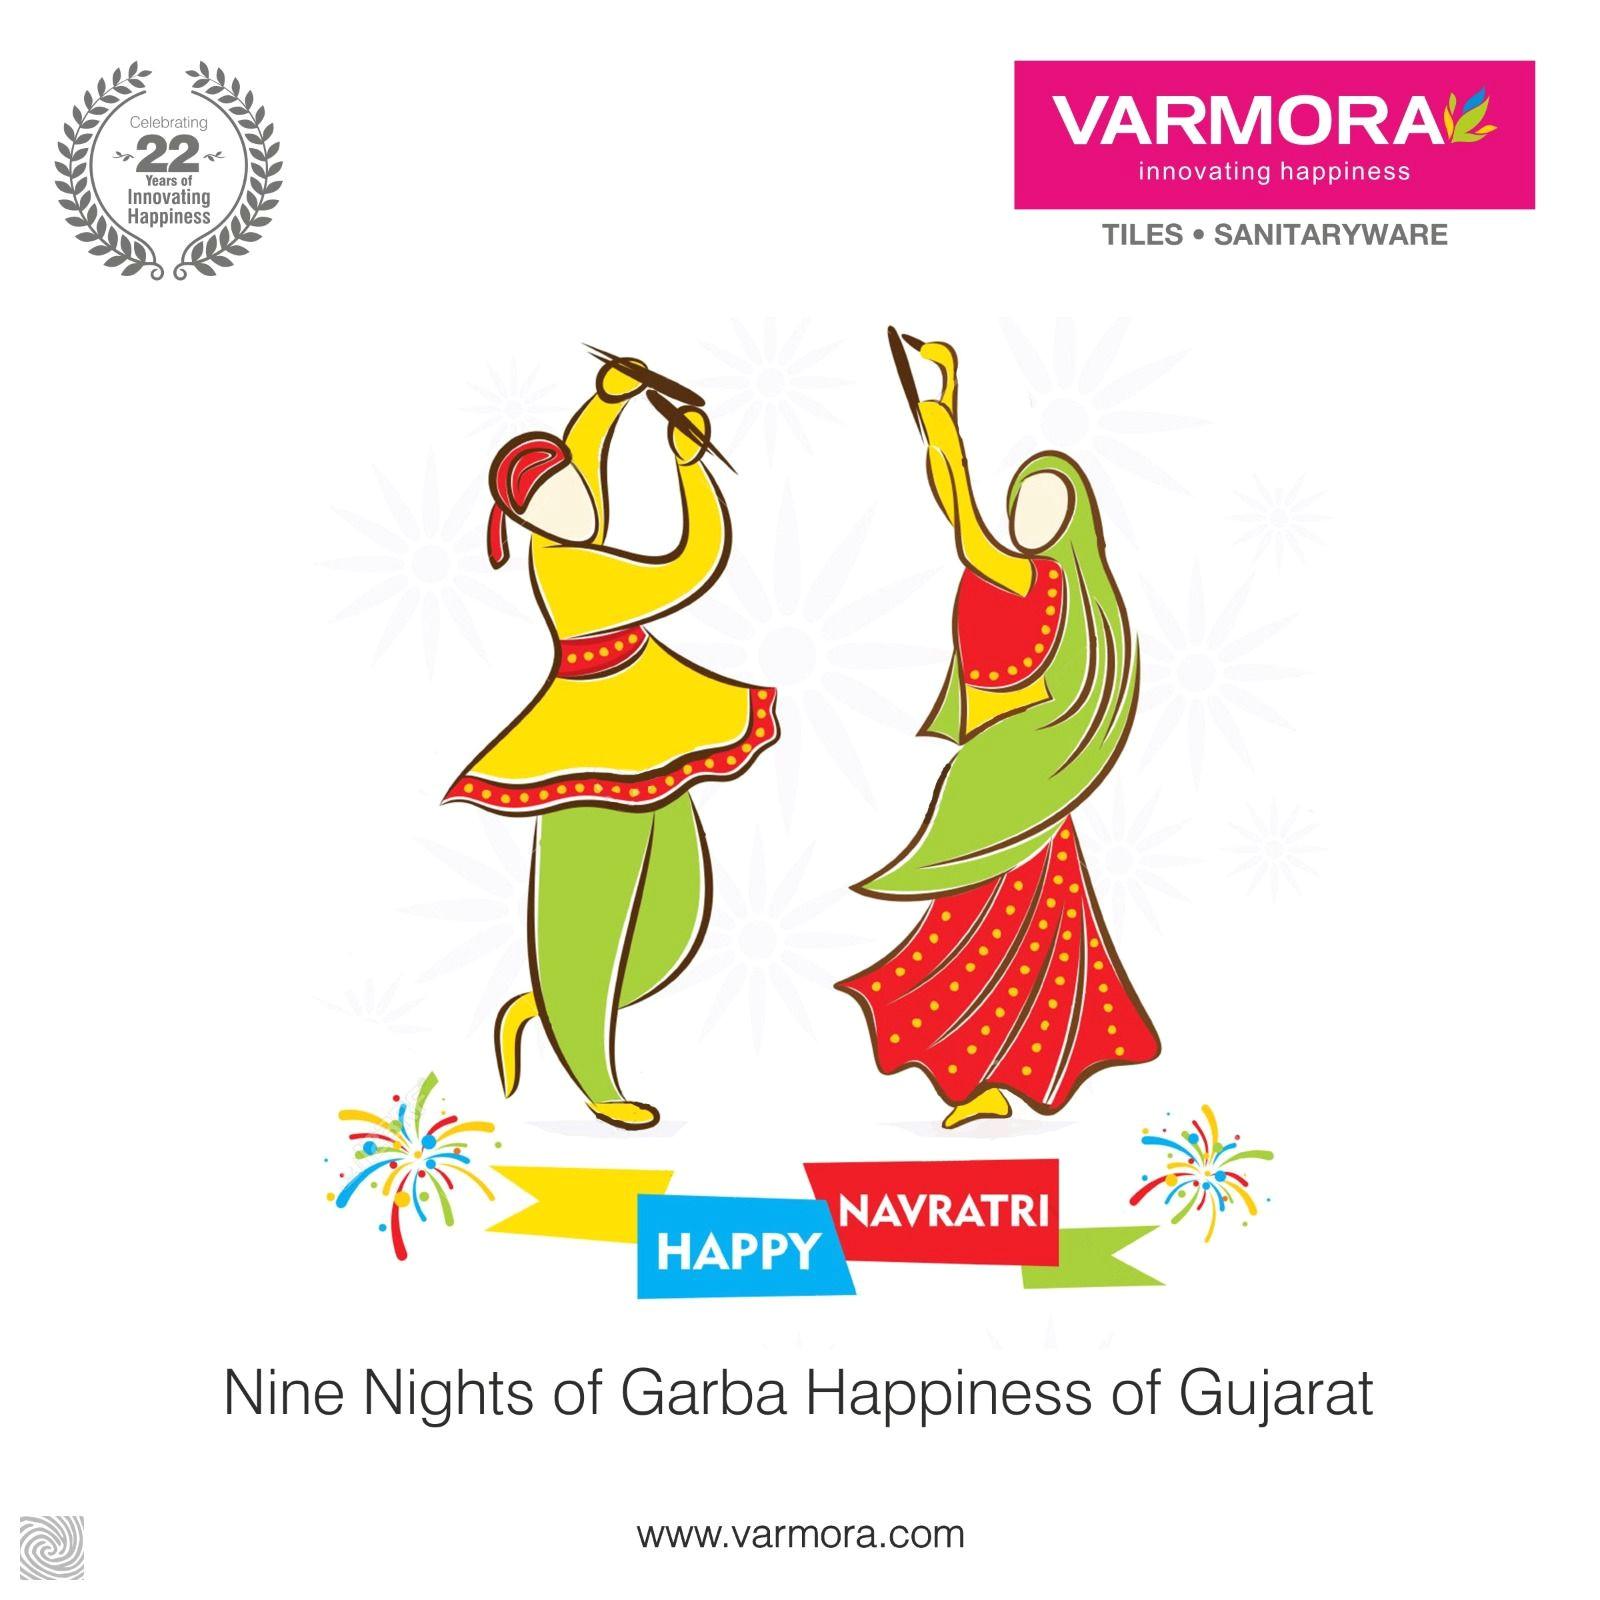 Easy Drawings Of Navratri Varmora Wishes Happy Navratri to All Navratri2016 Ambemaa